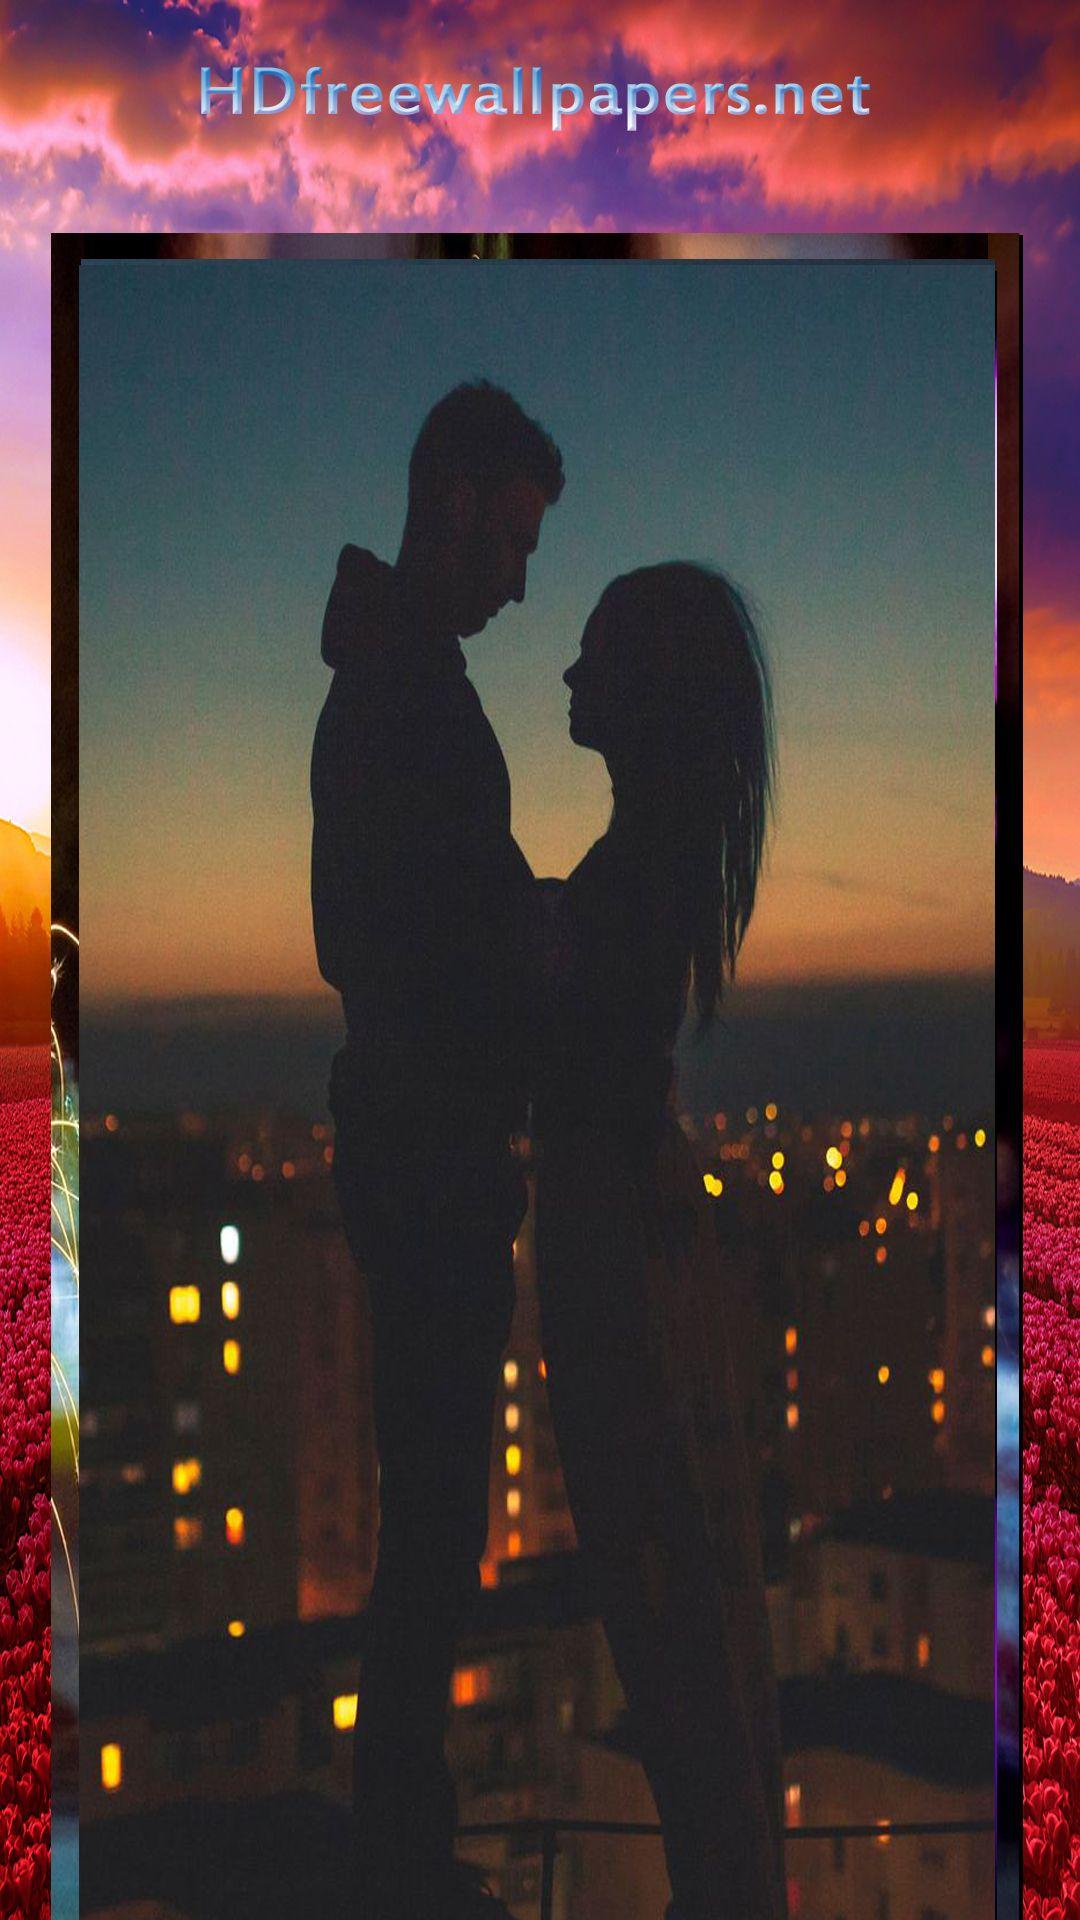 Broken Heart Wallpaper Couple - HD Wallpaper